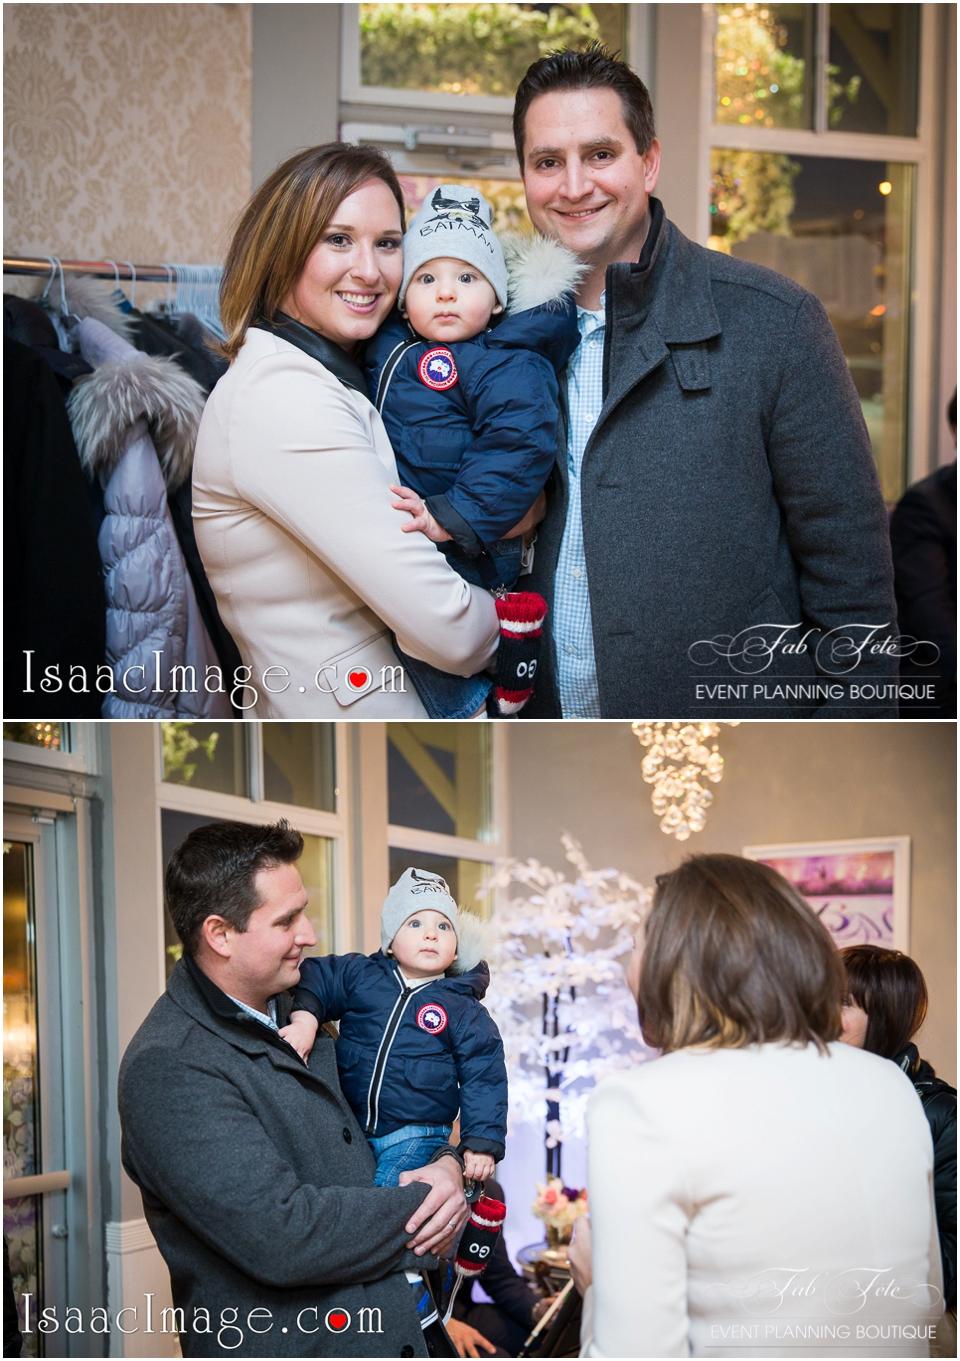 Fab Fete Toronto Wedding Event Planning Boutique open house_6469.jpg